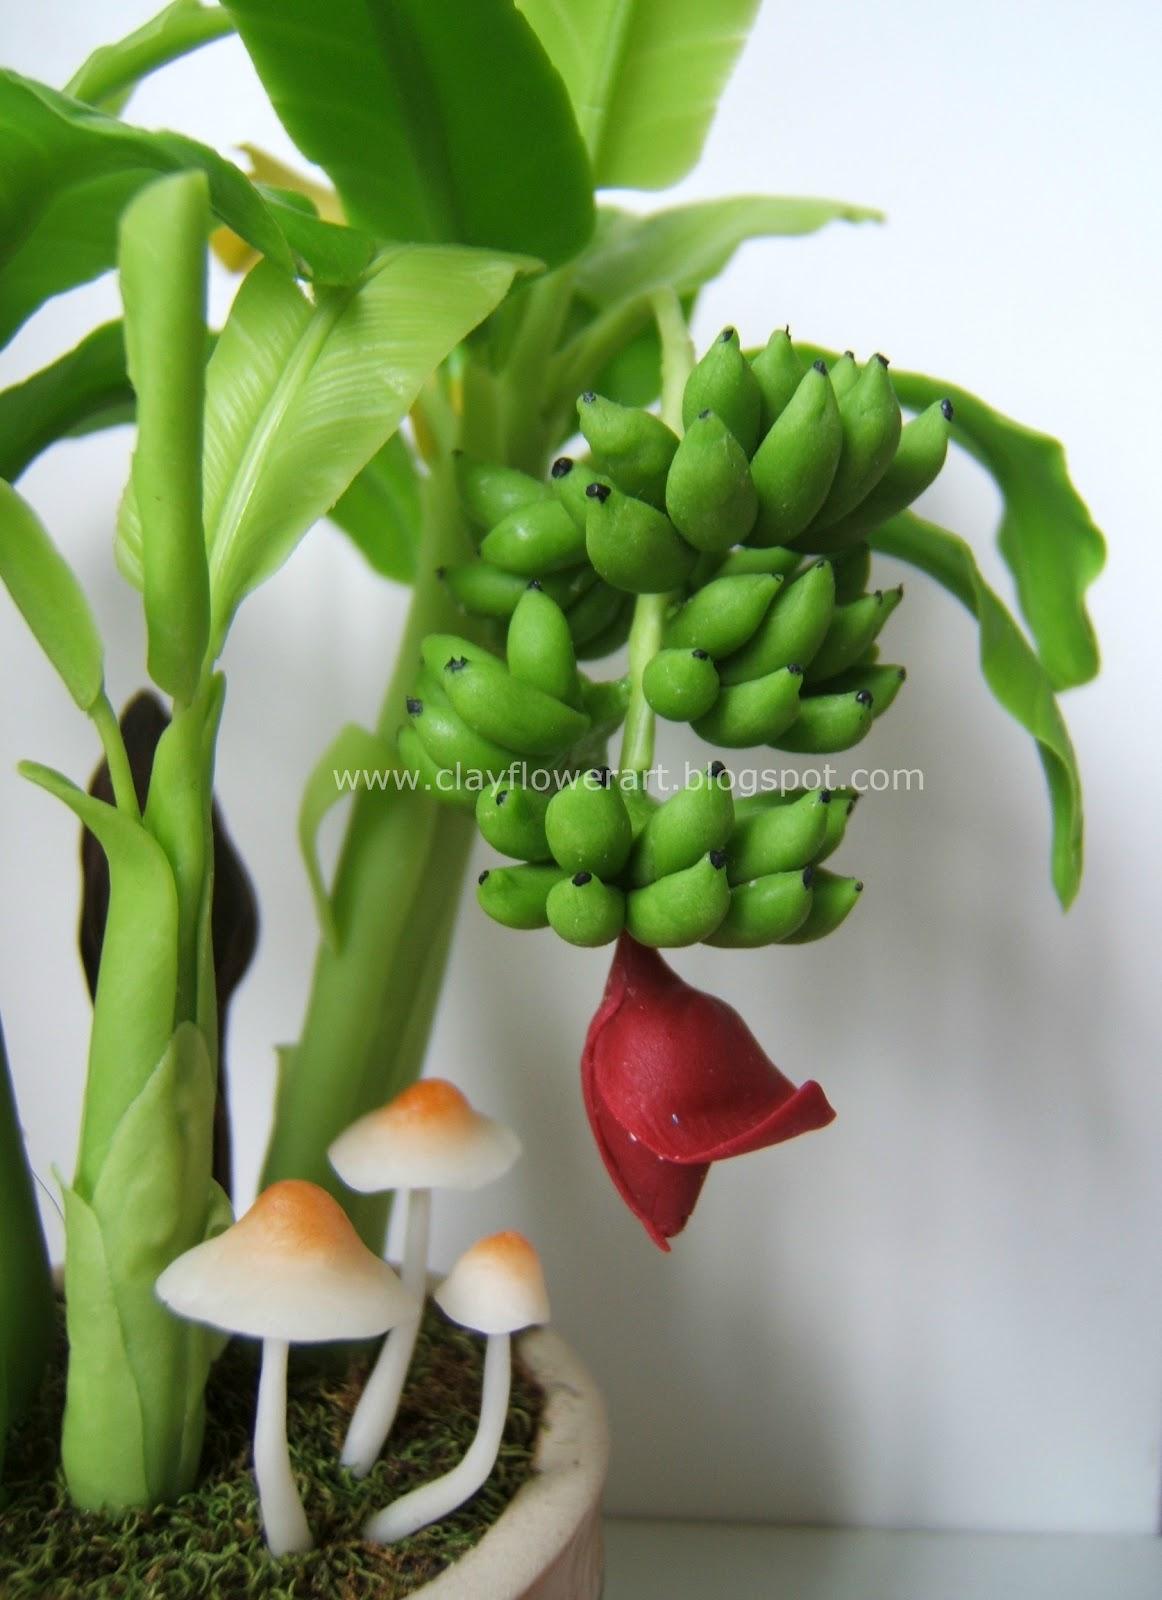 Miniature Banana Plant Clay Flower Art